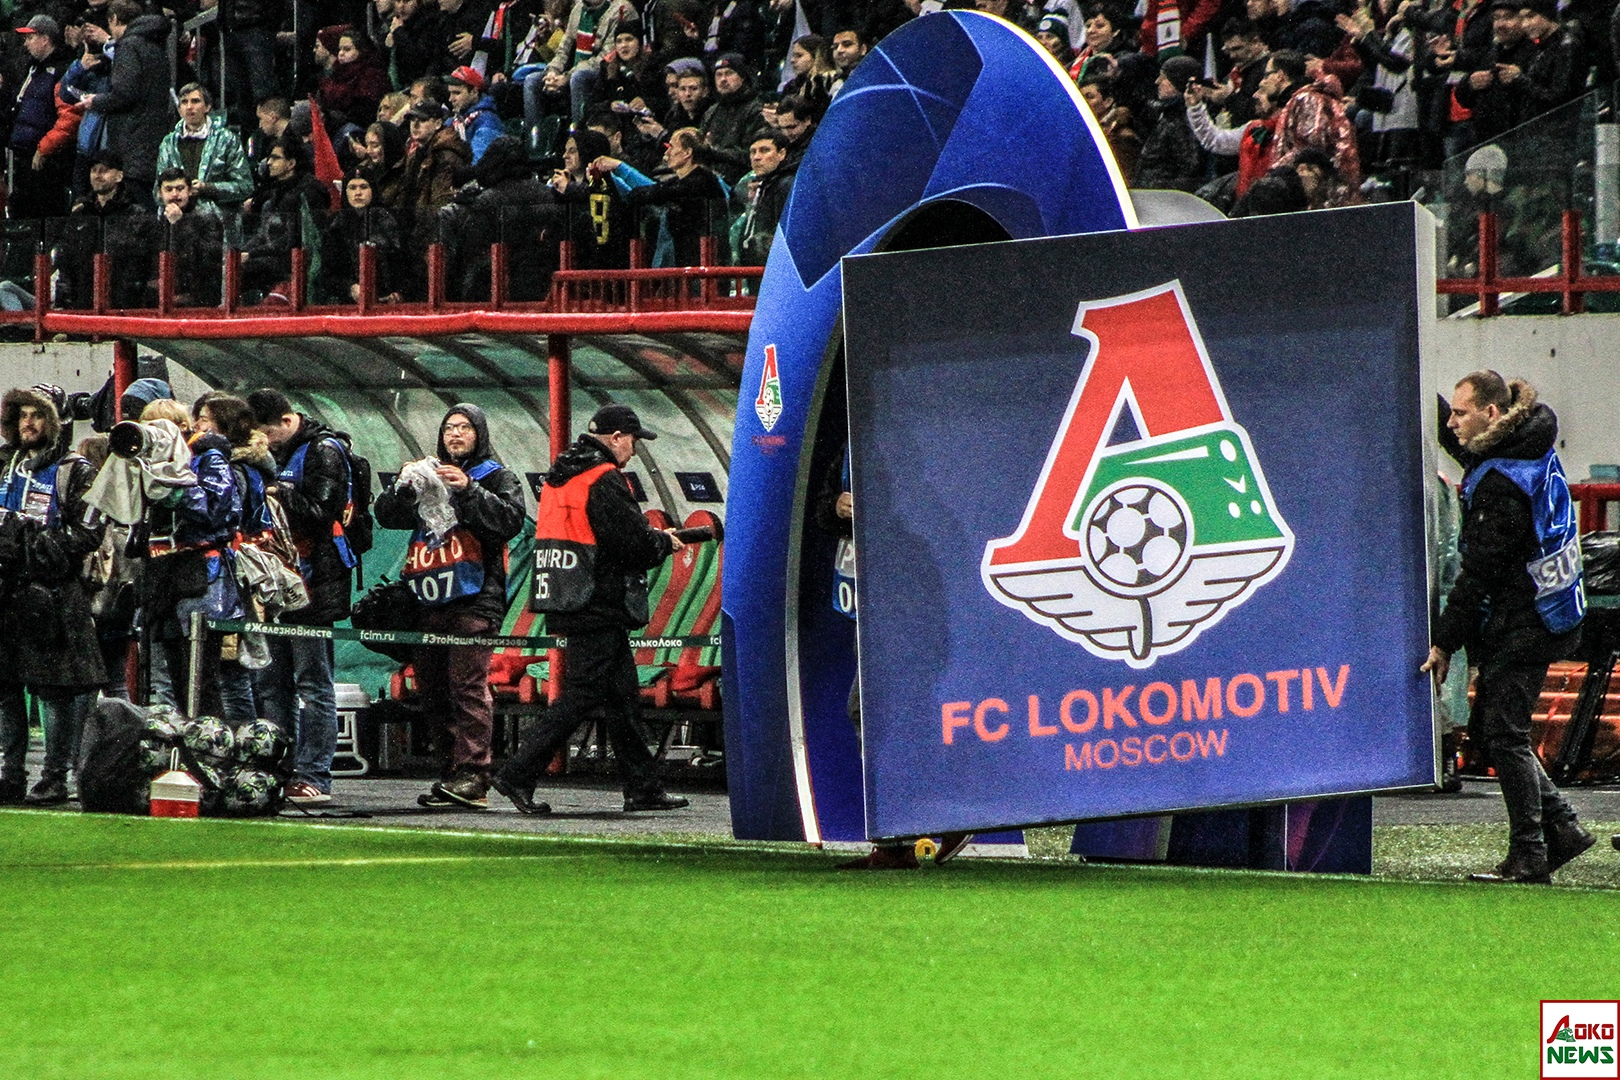 Локомотив - Ювентус. Фото: Дмитрий Бурдонов / Loko.News